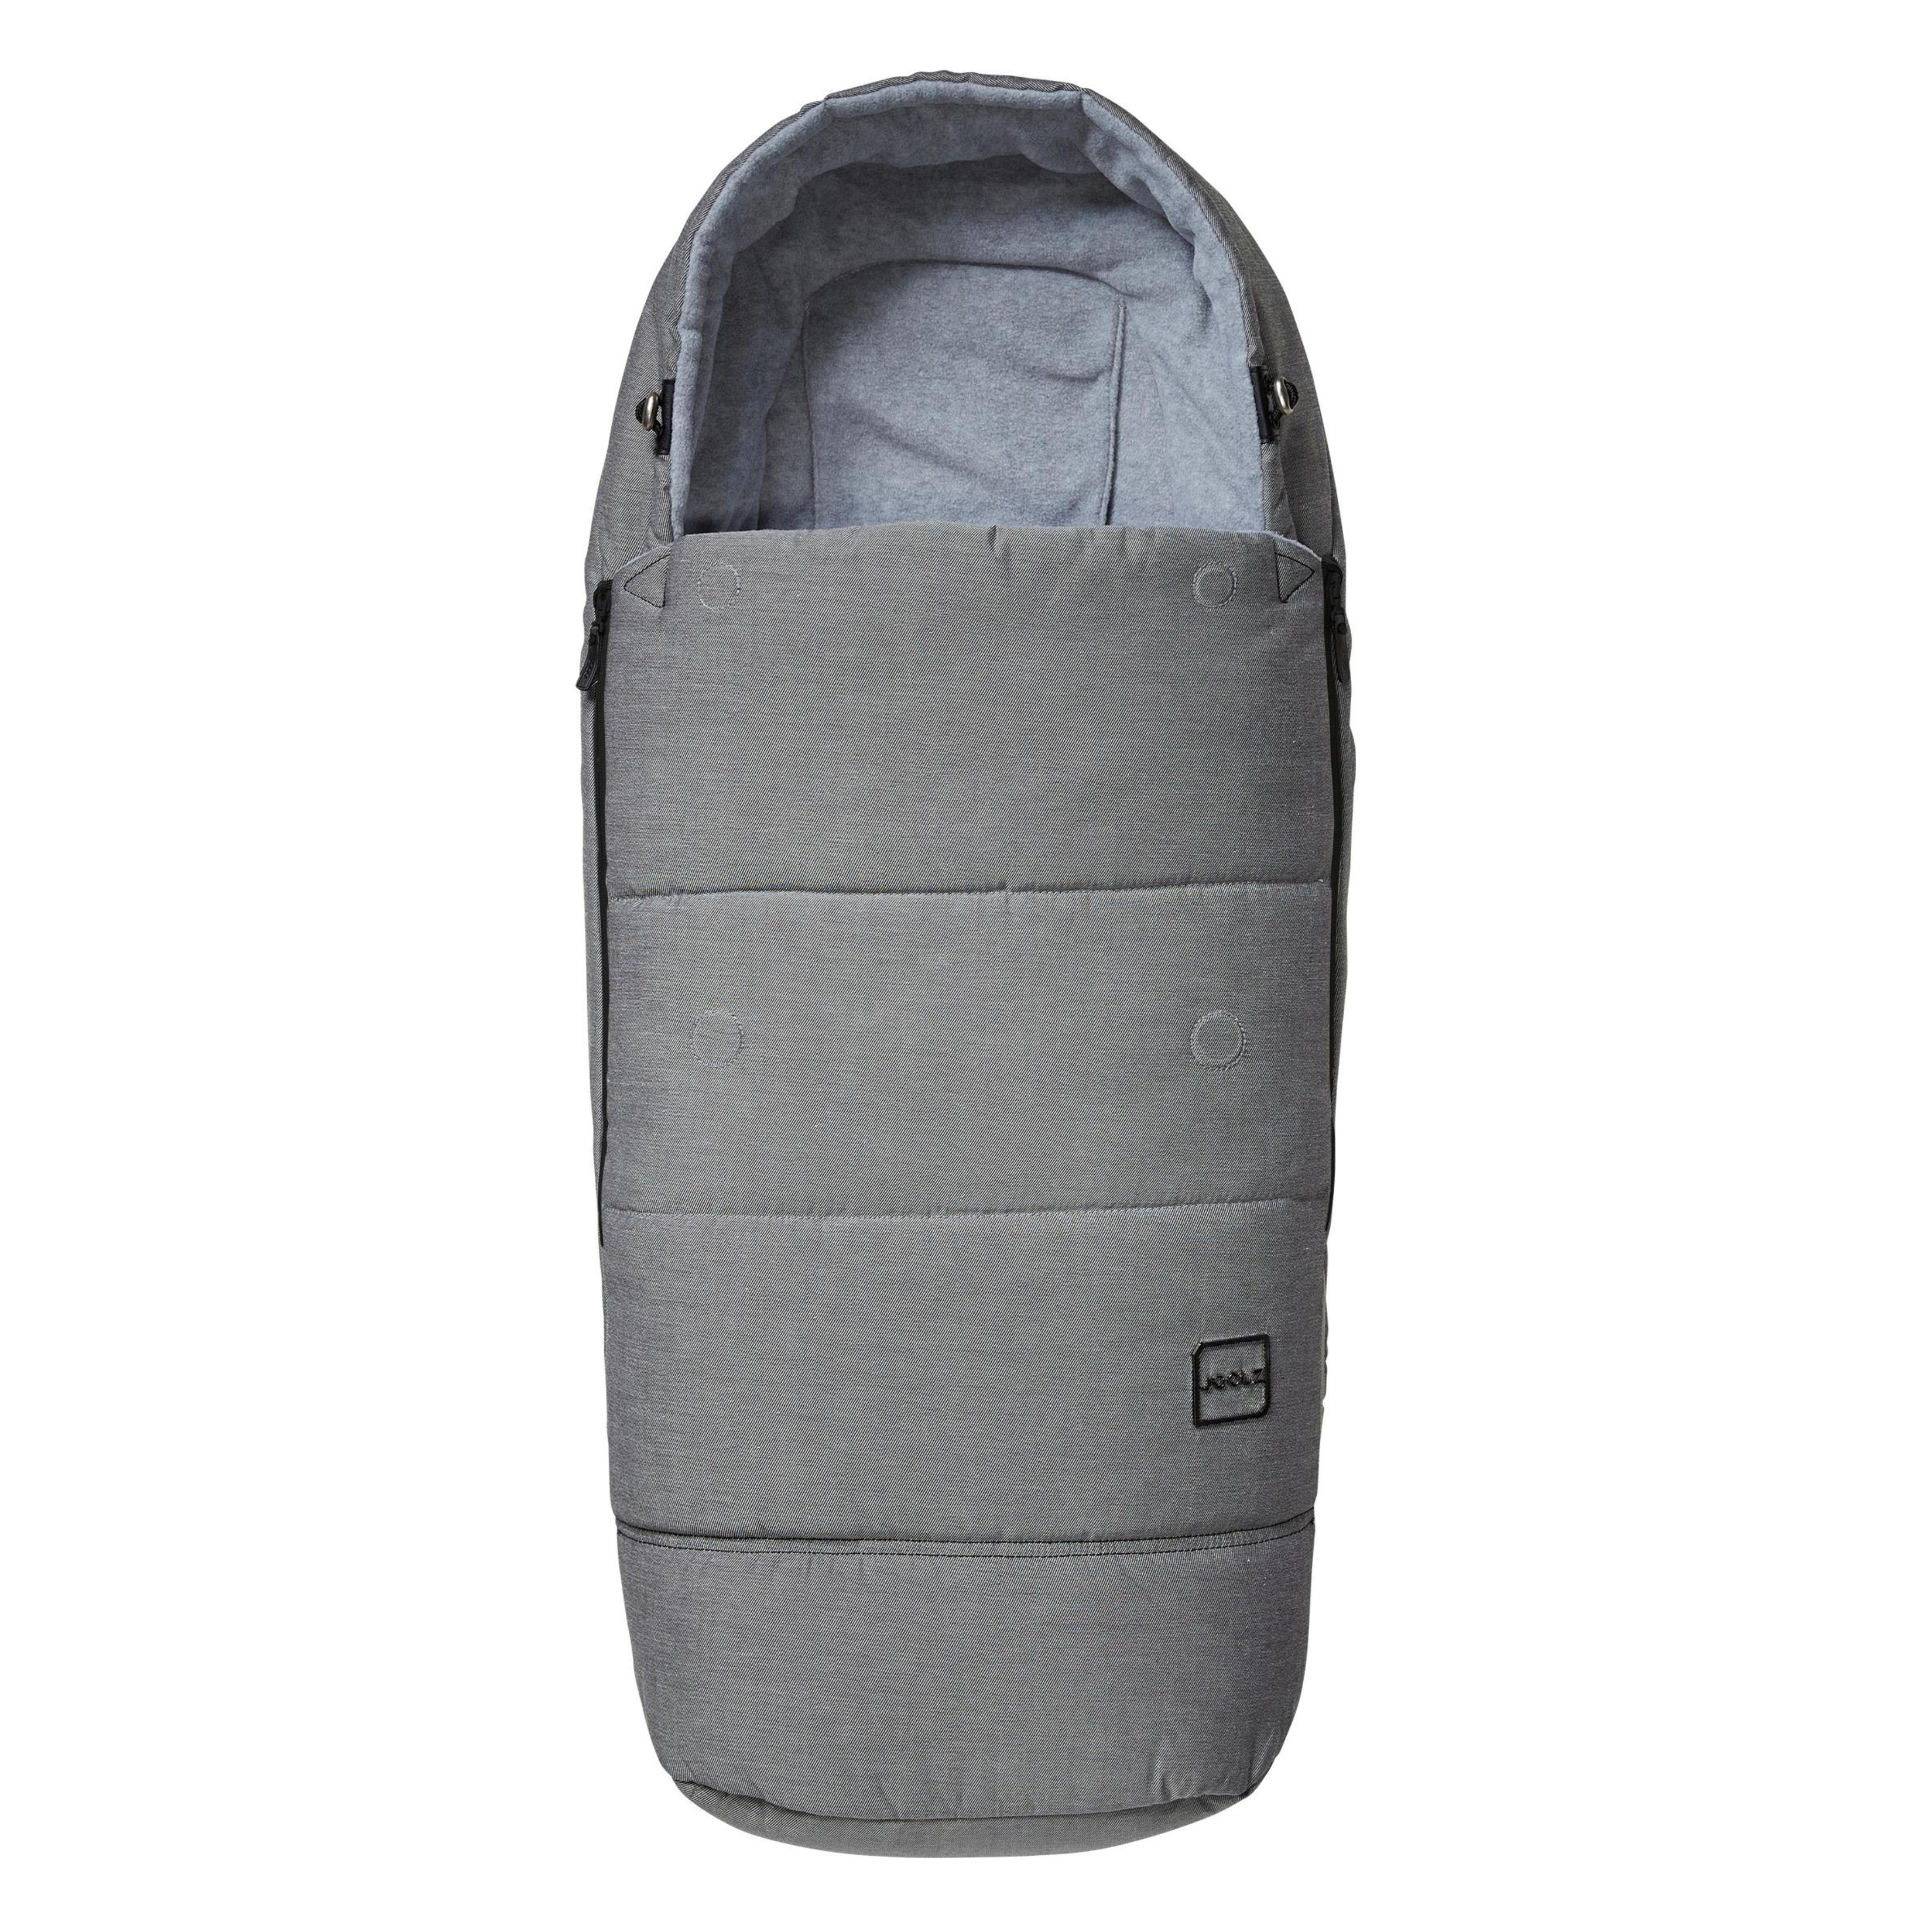 Joolz-Fusssack-Superior-Grey0QXlnLhwmEbv2